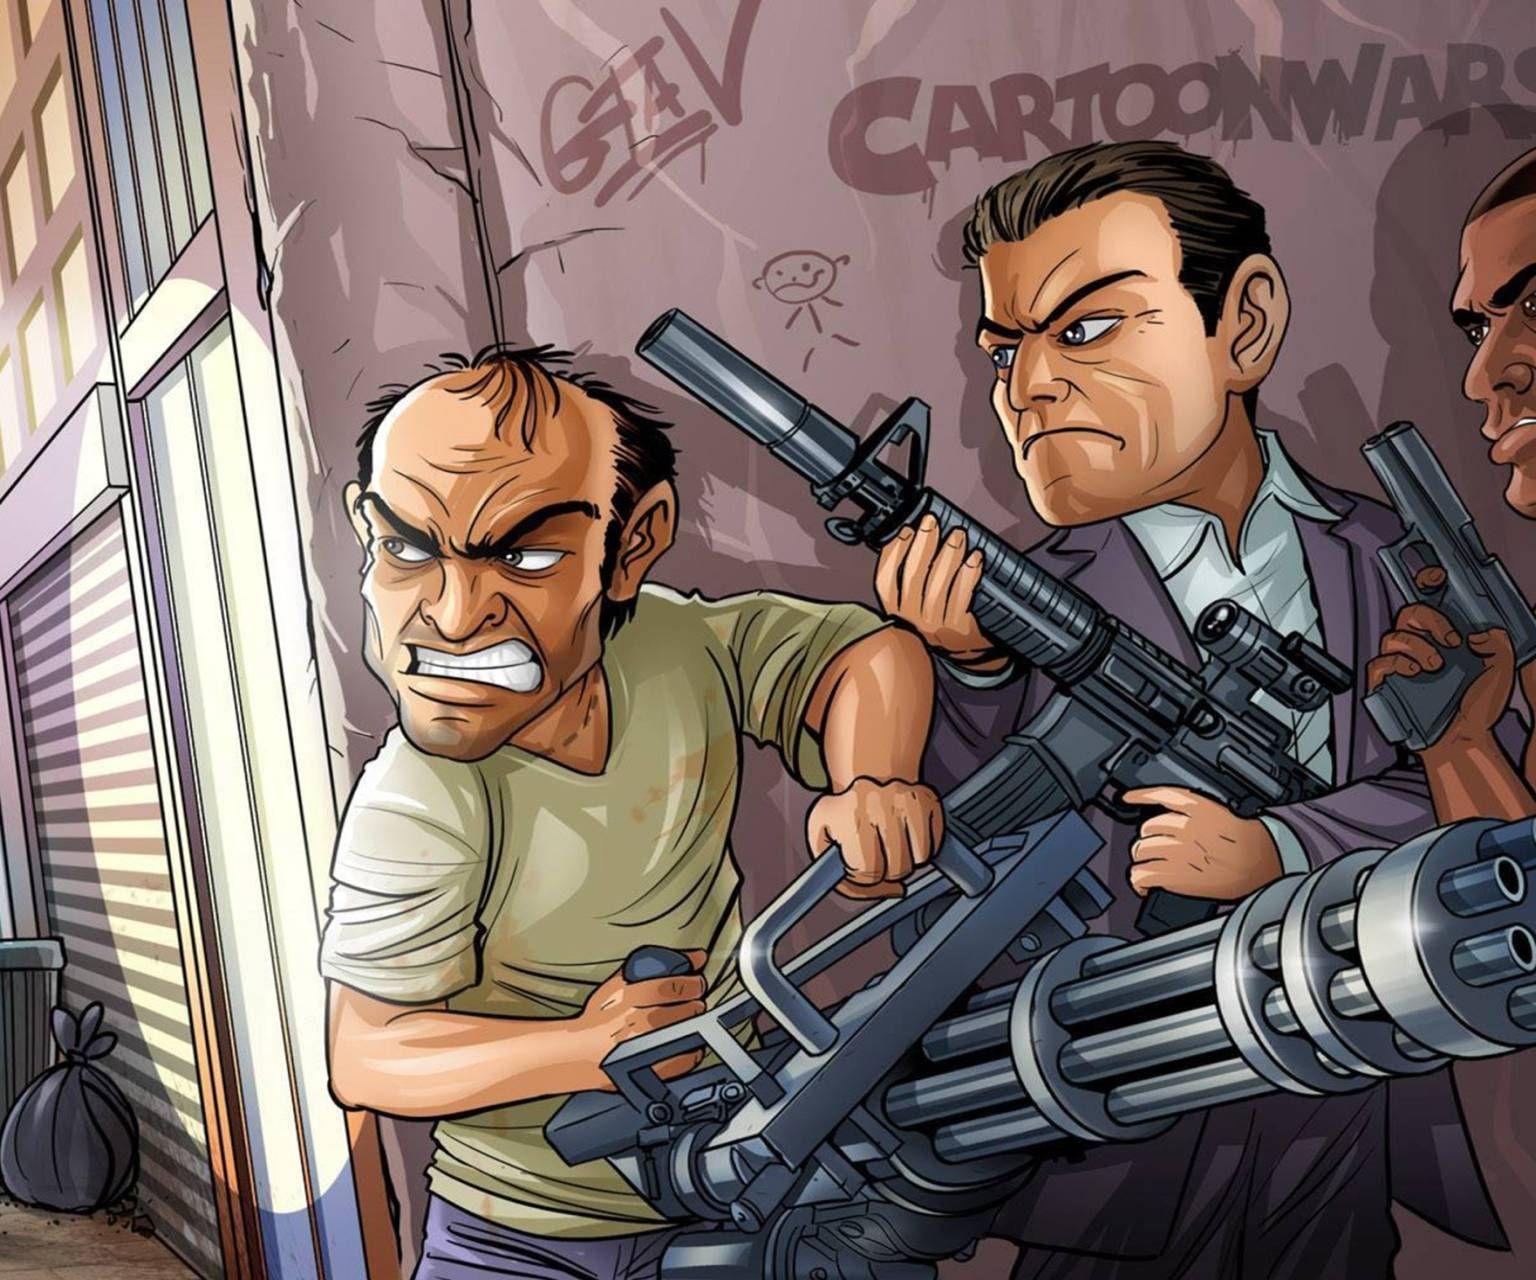 Download gta cartoon wallpaper by __JULIANNA__ 3d Free